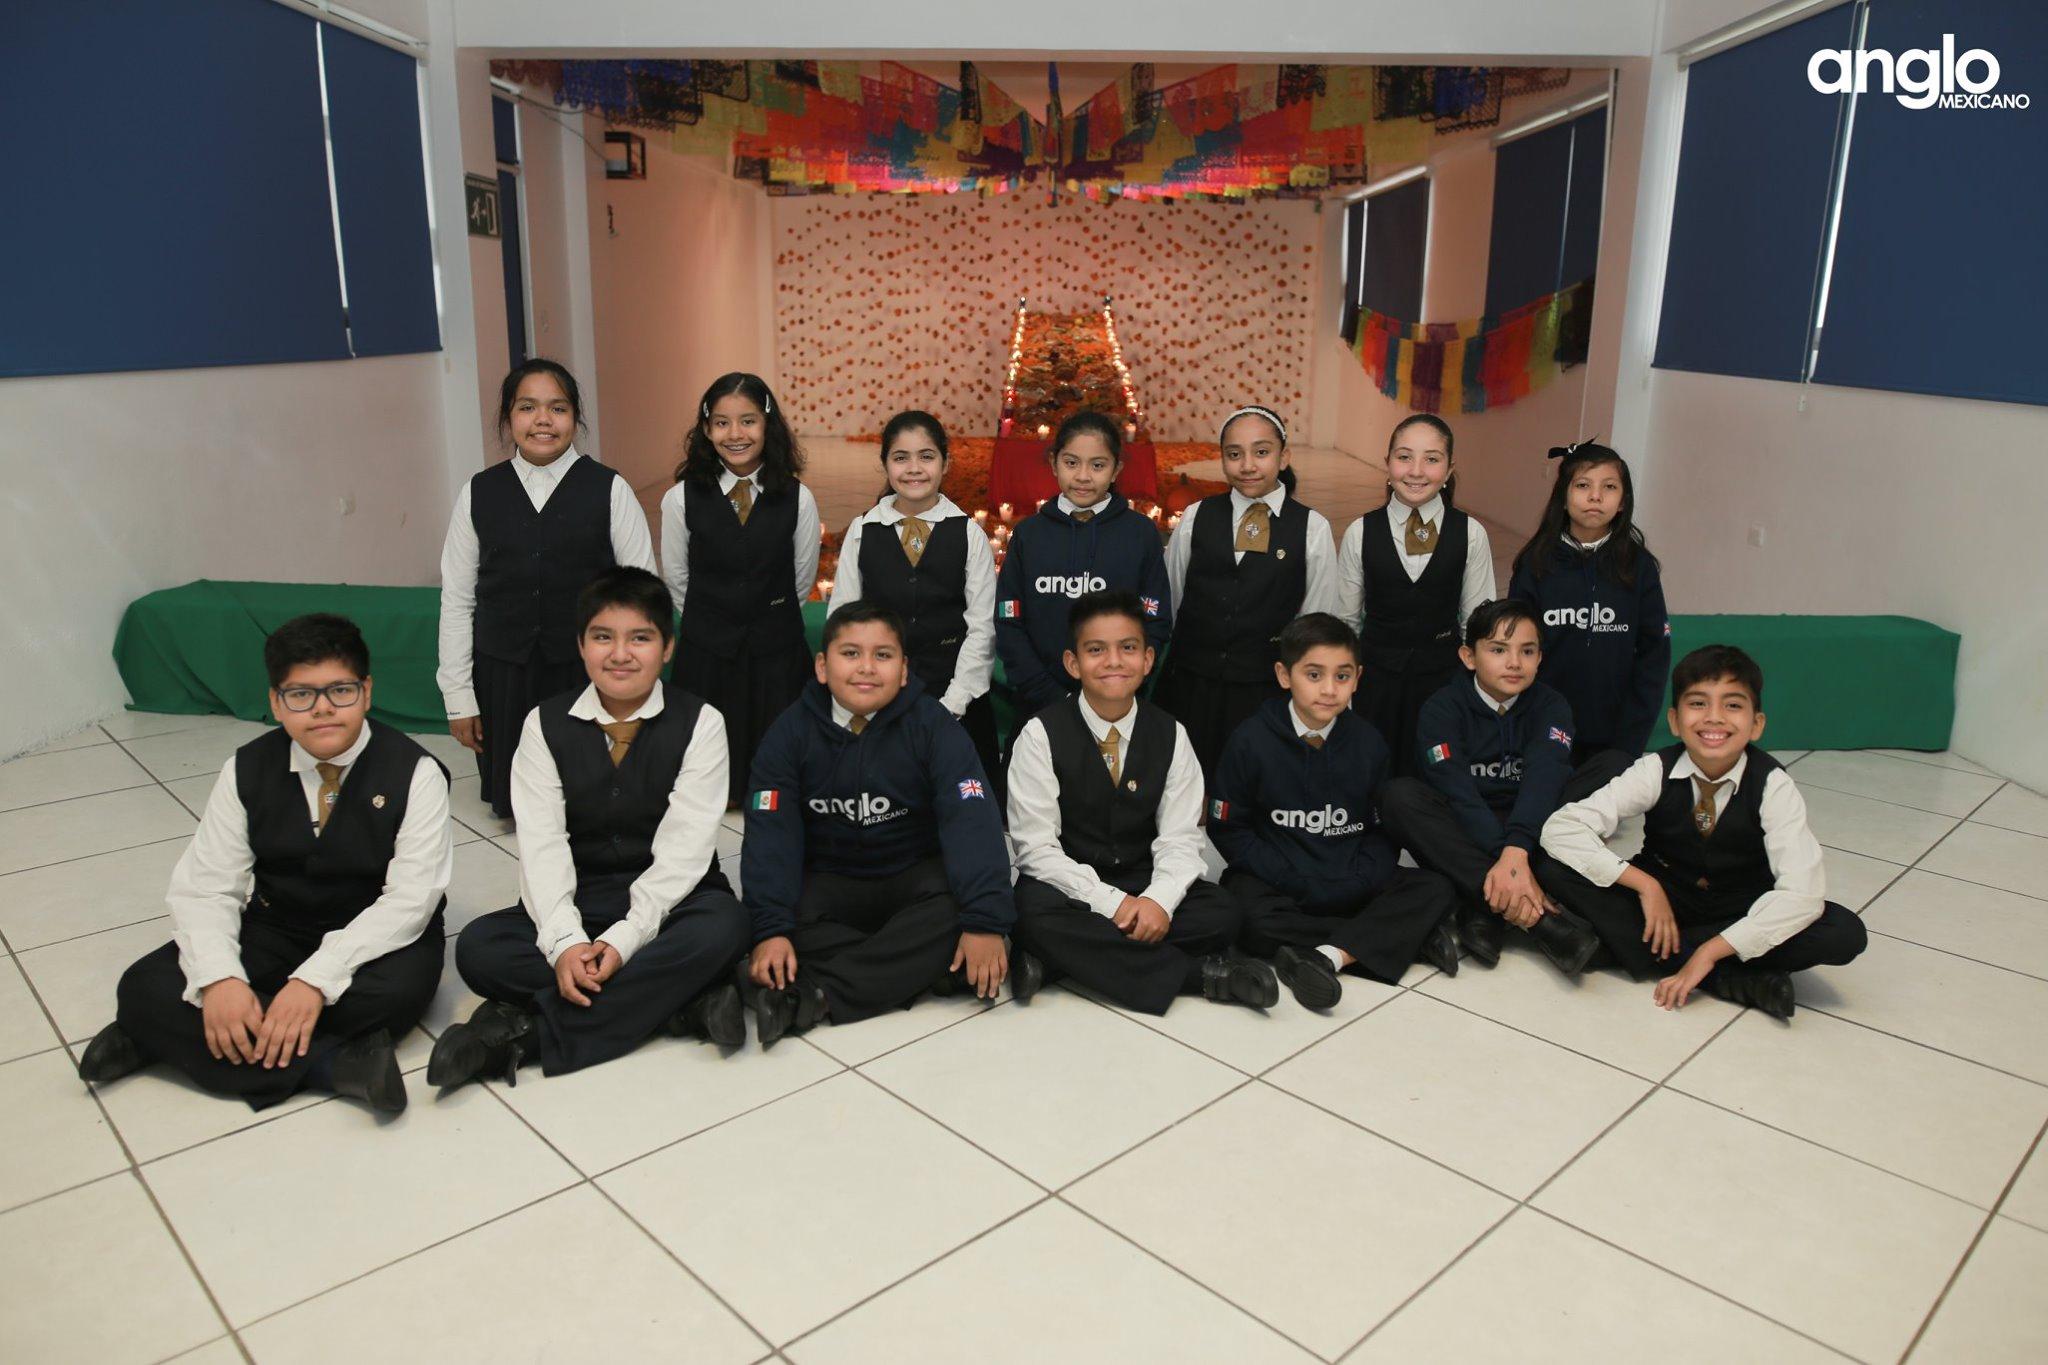 ANGLO MEXICANO DE COATZACOALCOS-VISITA-ALTARES-025